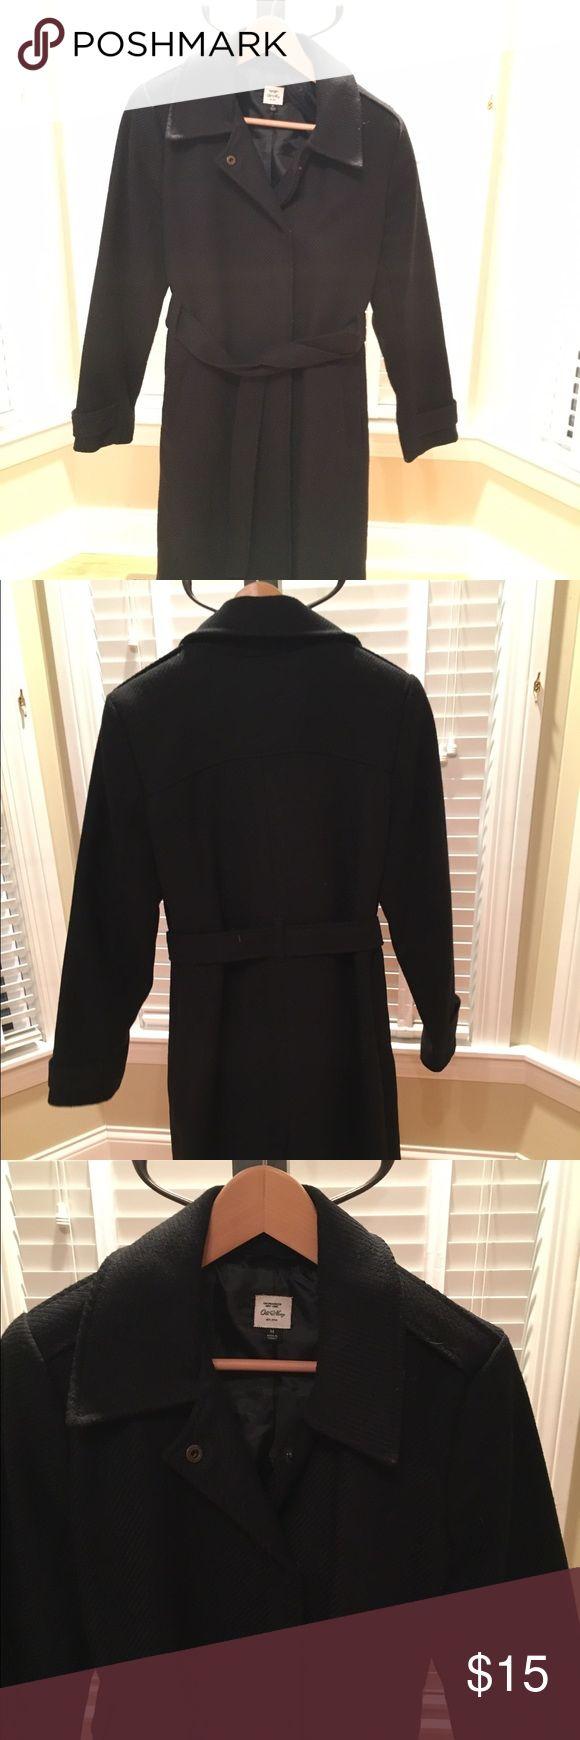 Long black coat Old Navy winter dress coat Jackets & Coats